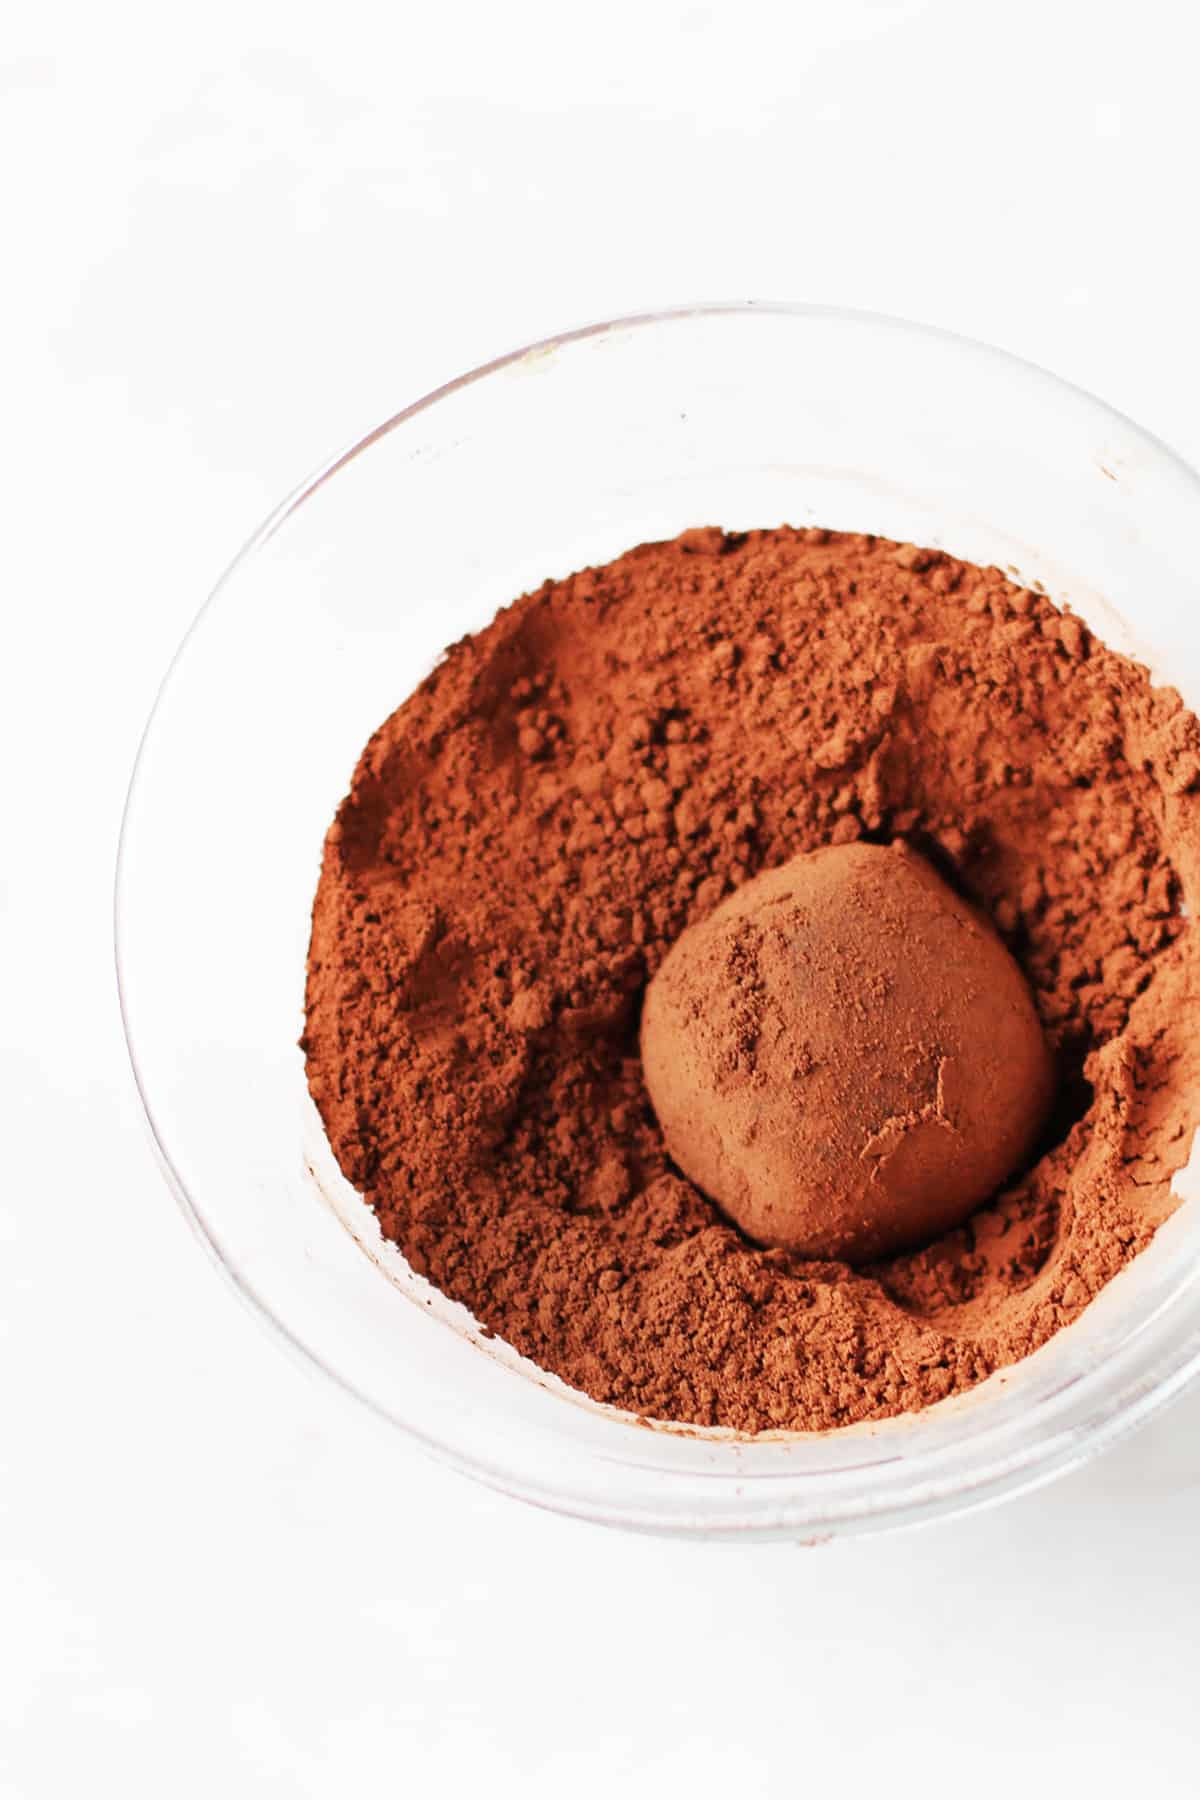 Chocolate truffle in cocoa powder.